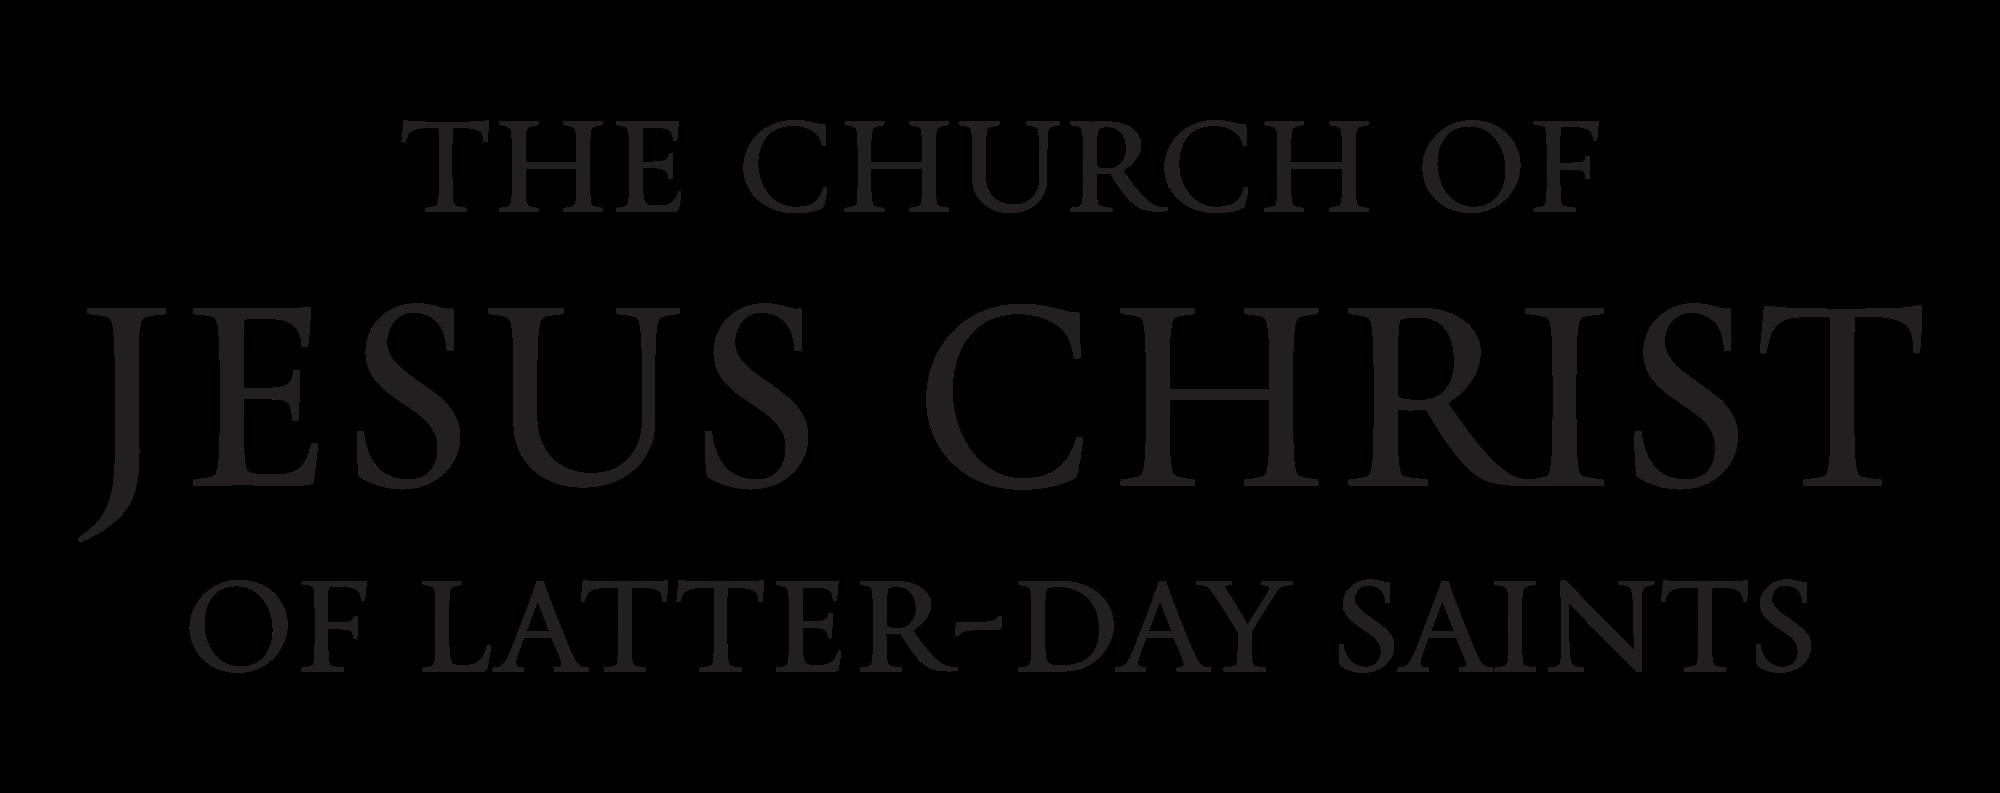 E clipart latter. File logo of the